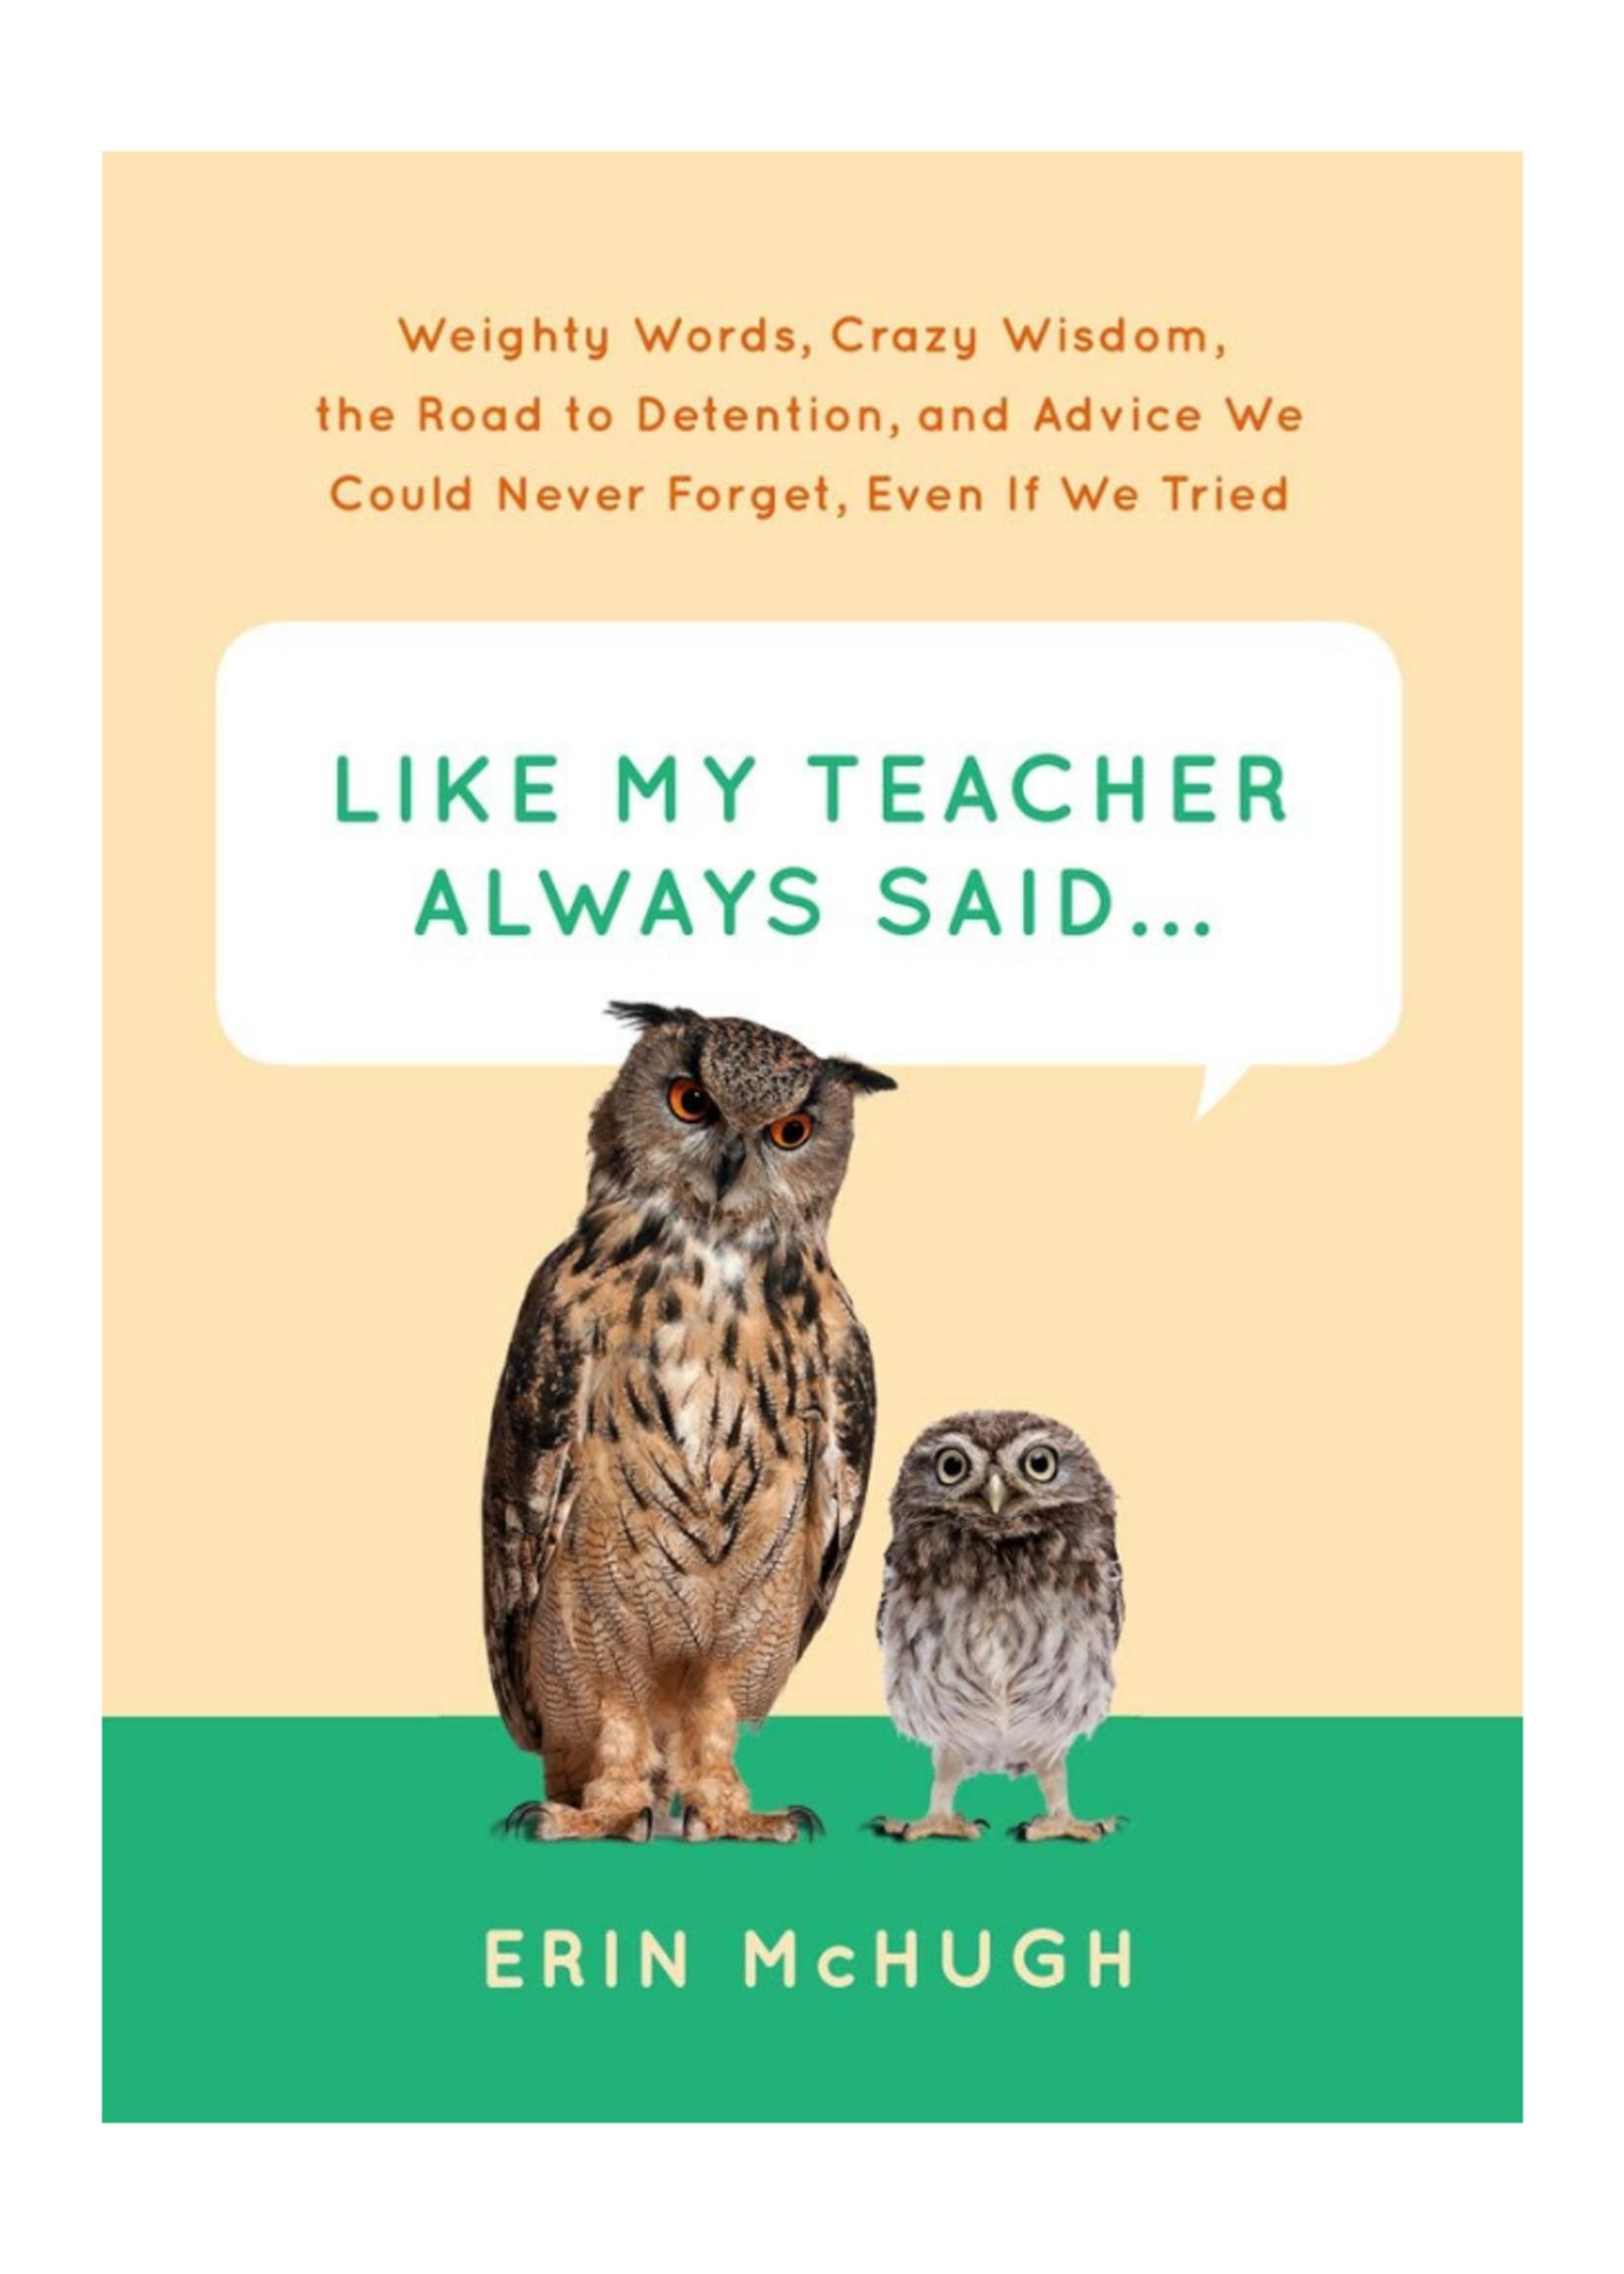 Abrams Sterart Tabori&Chang Like My Teacher Always Said... By Erin McHugh